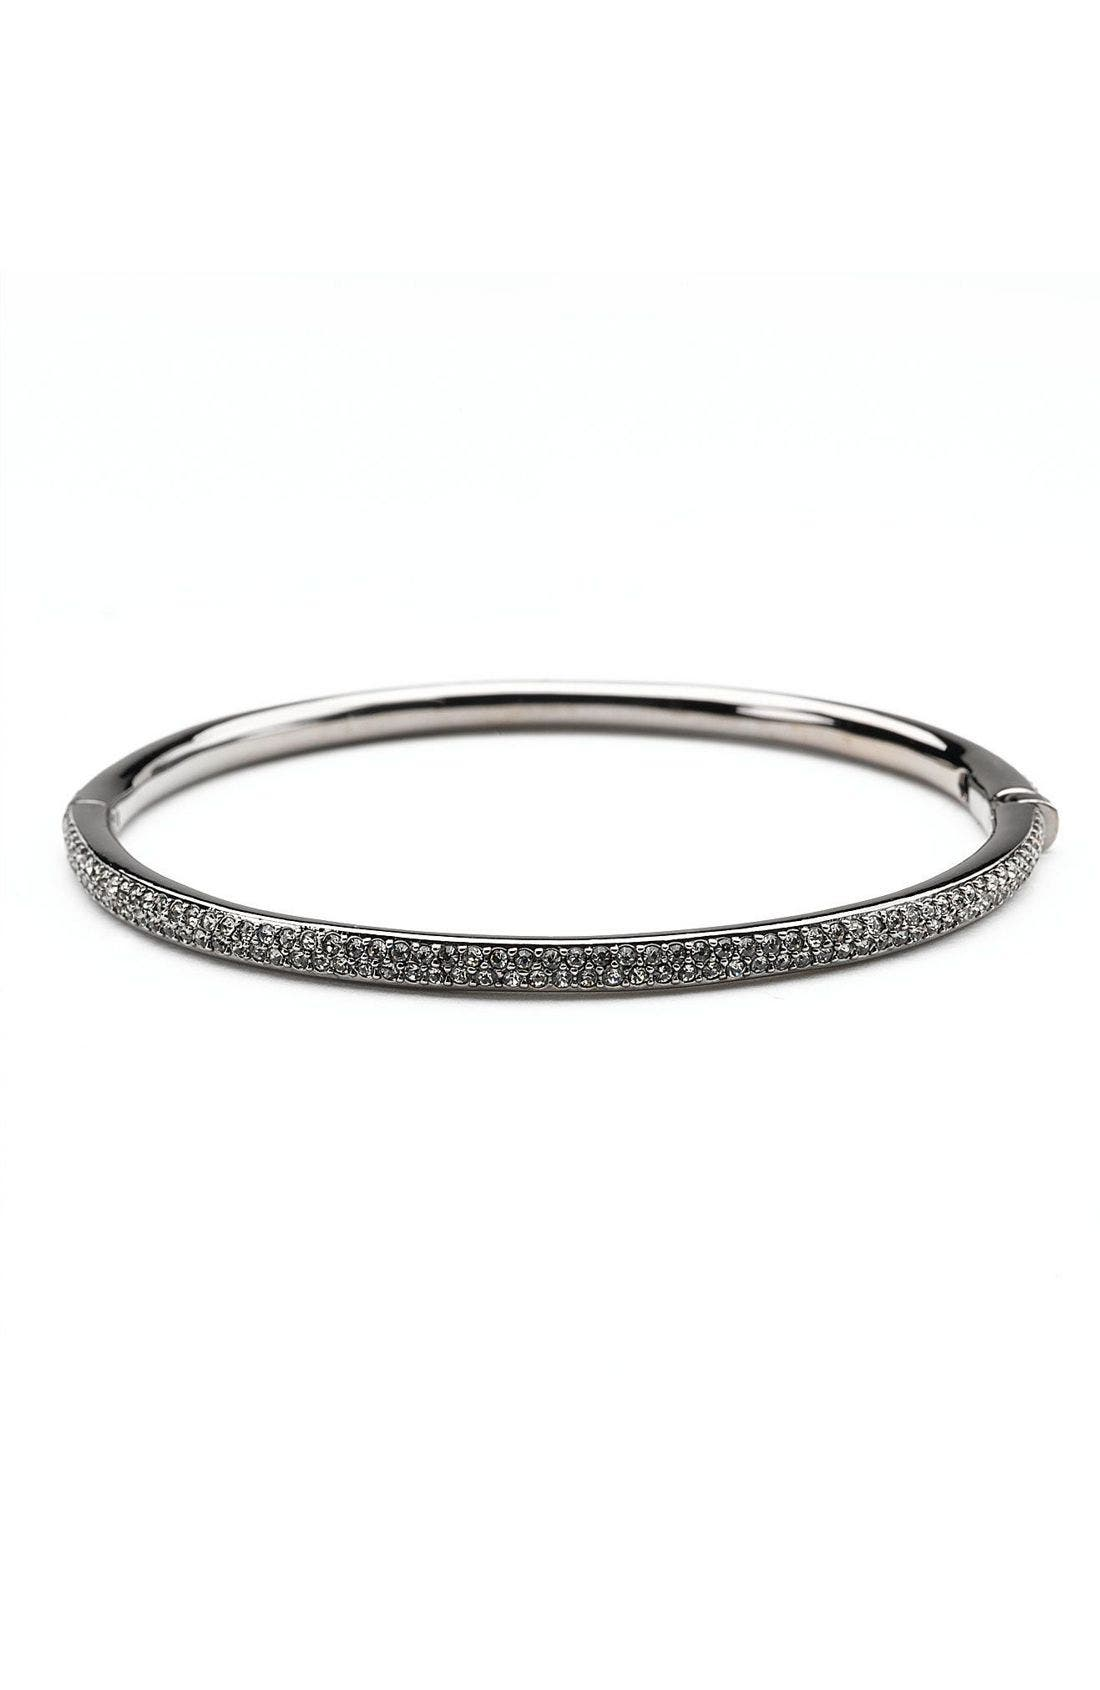 Main Image - Nadri Pavé Bangle Bracelet